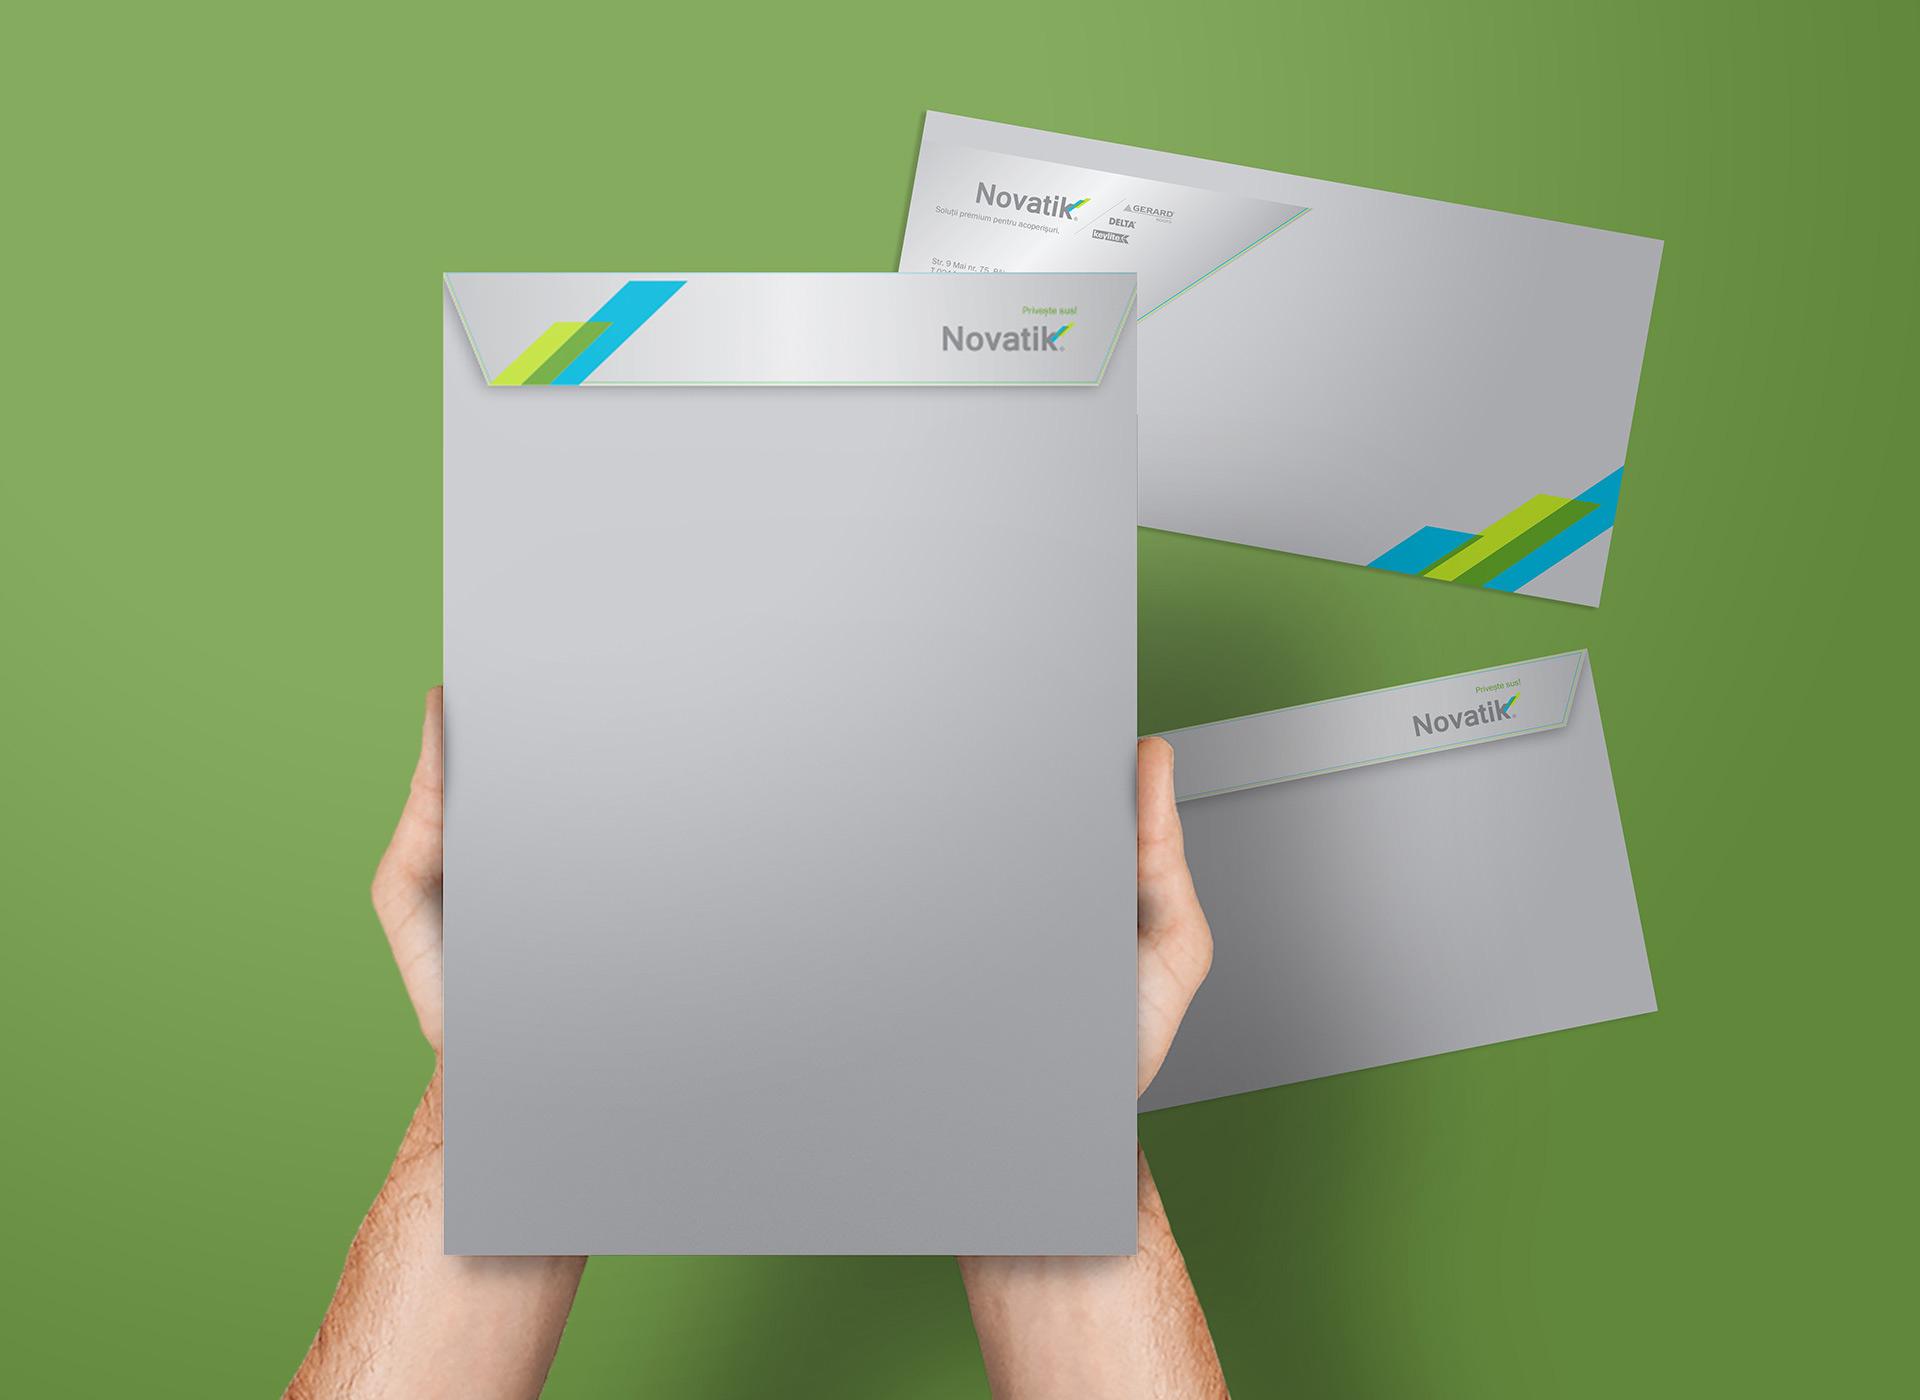 novatik portofoliu branding envelope